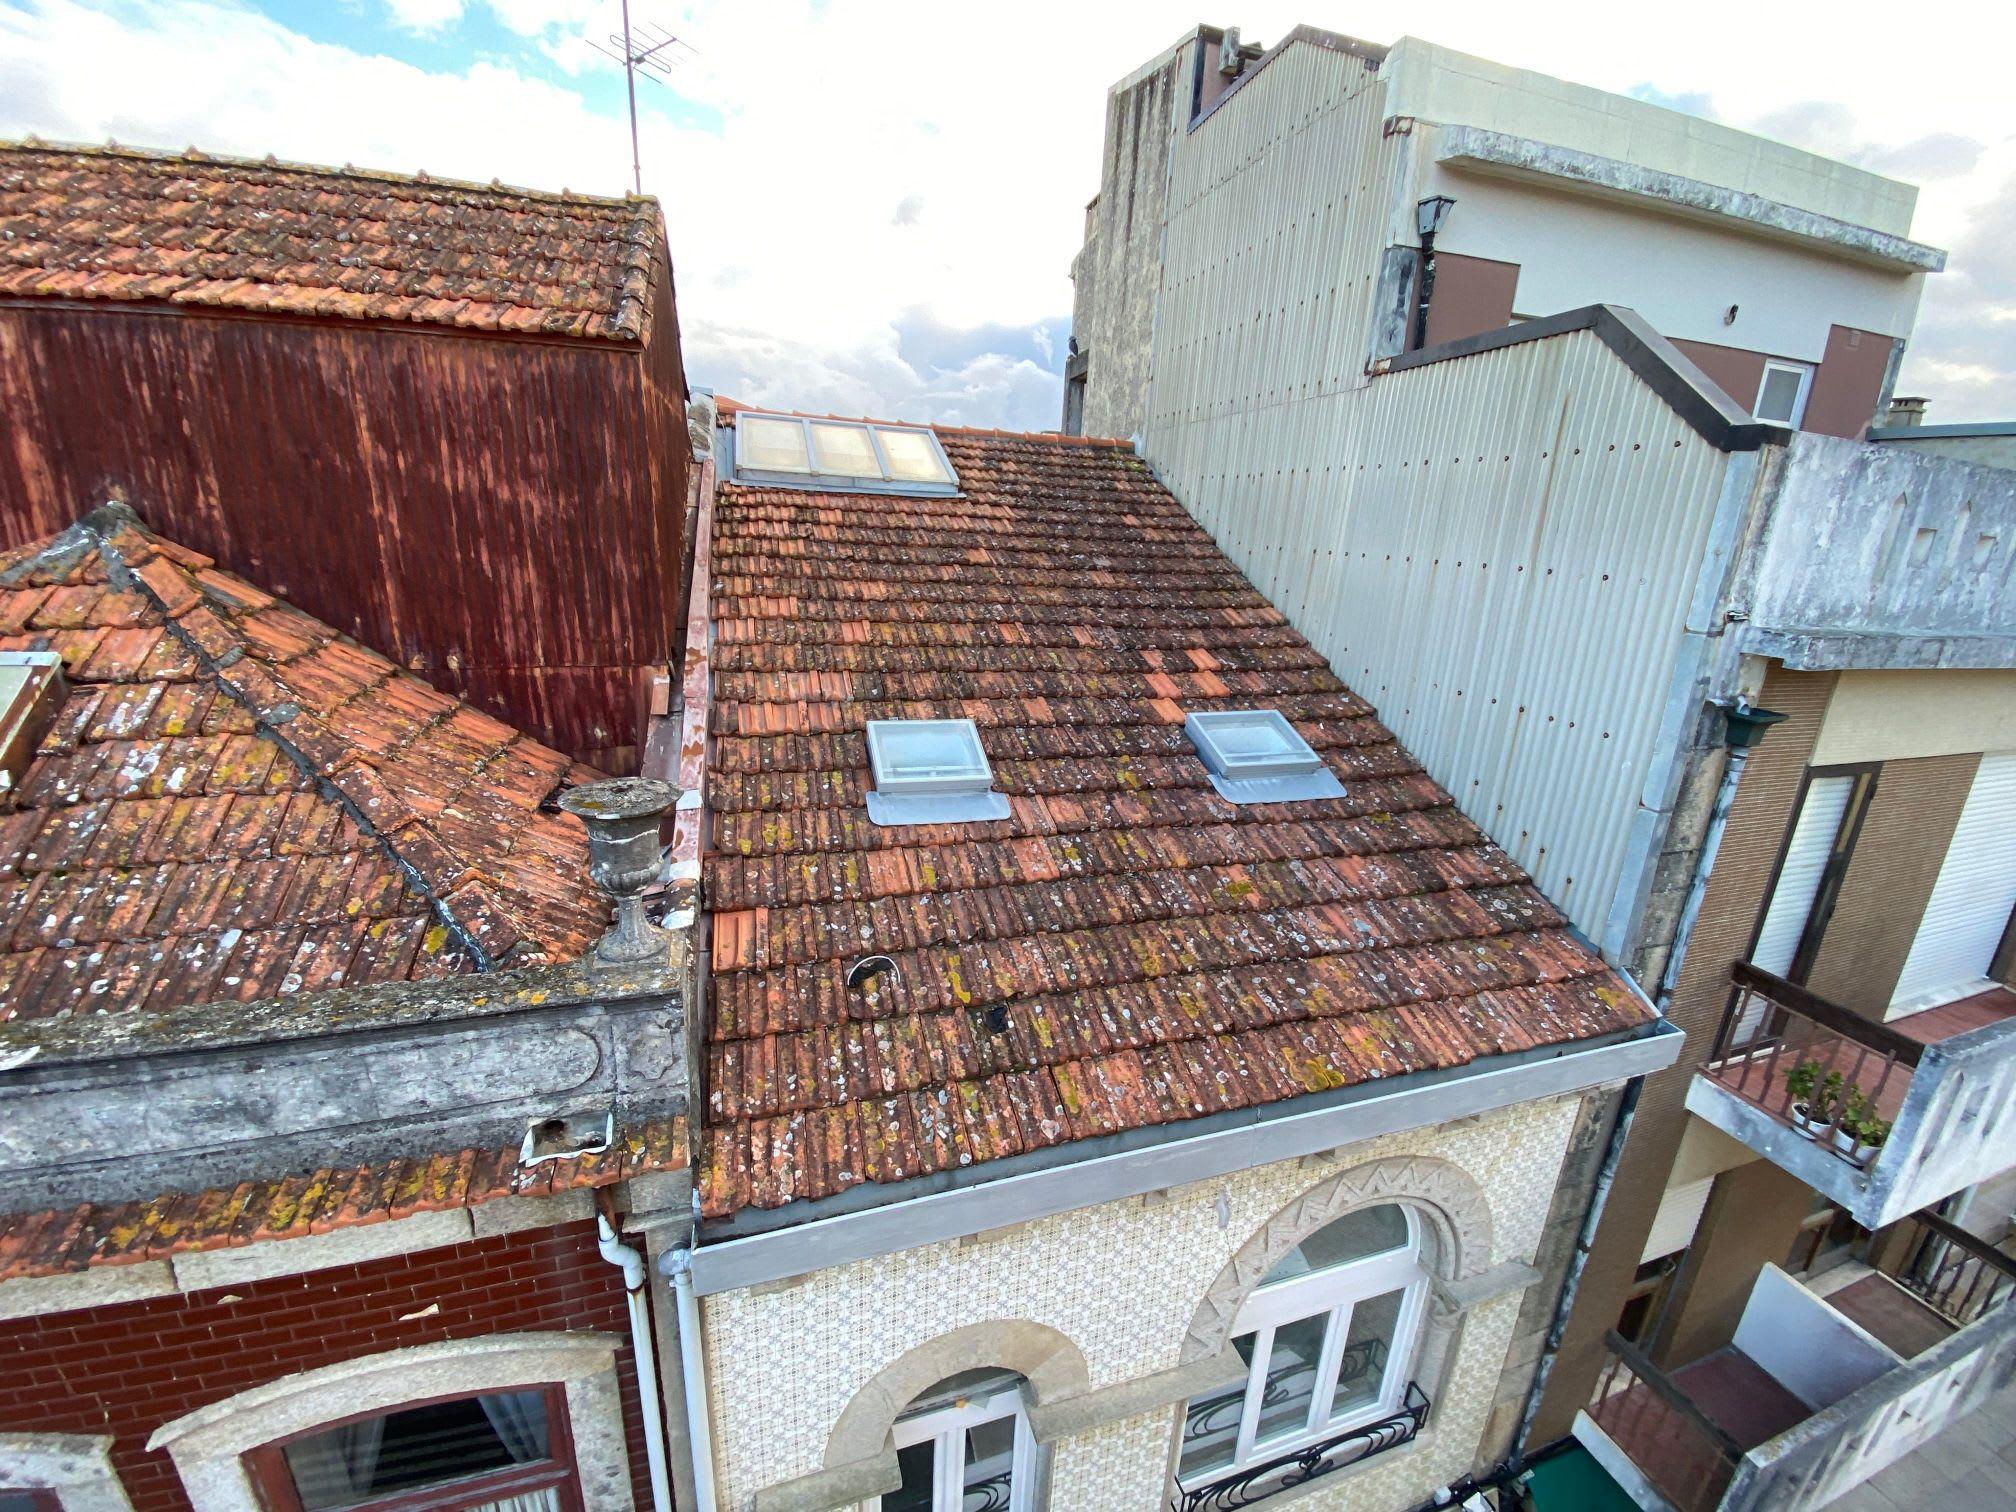 post Limpeza de telhado - ficou como novo image